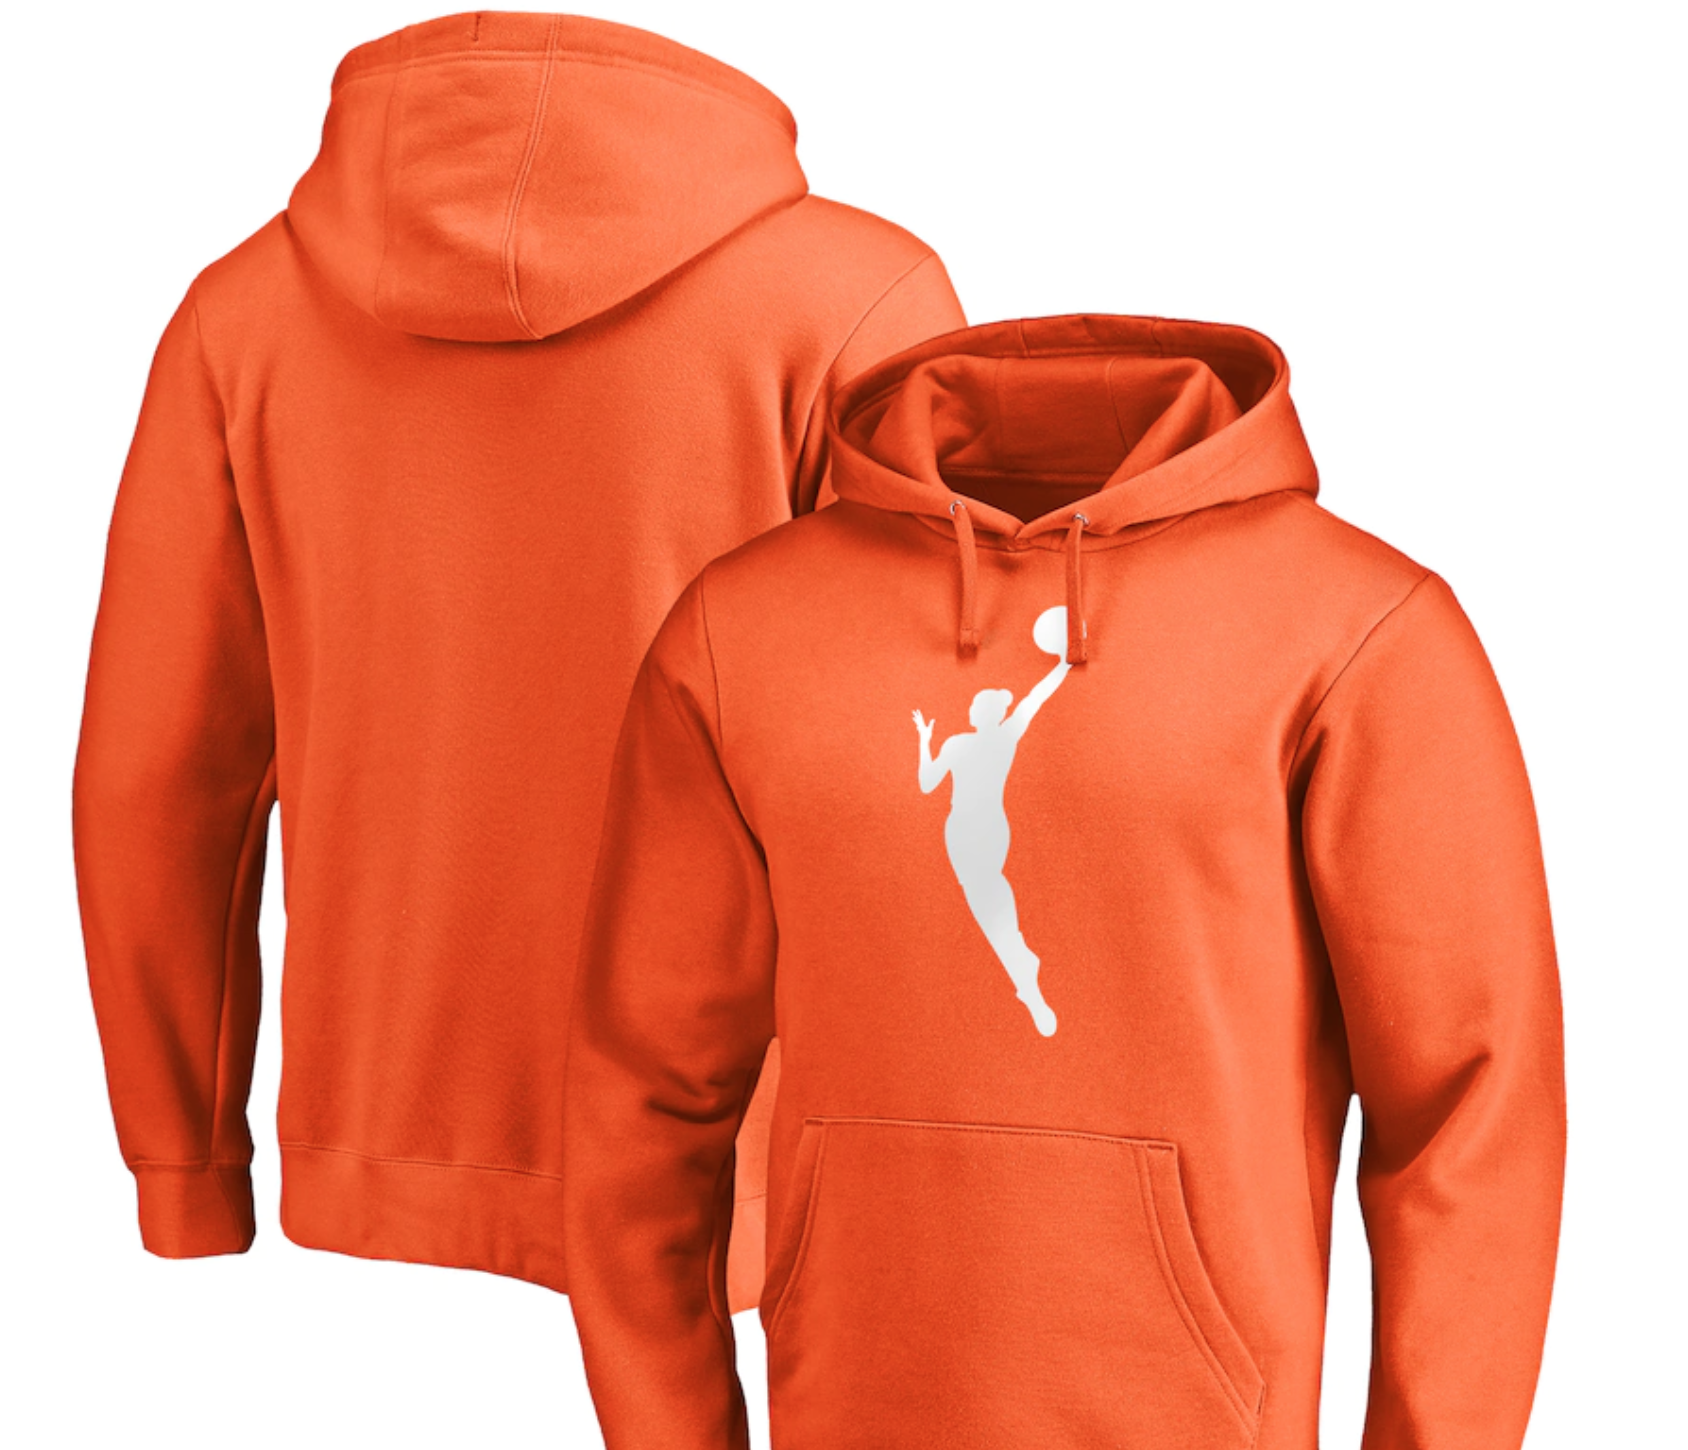 WNBA Orange Hoodie, Where to get